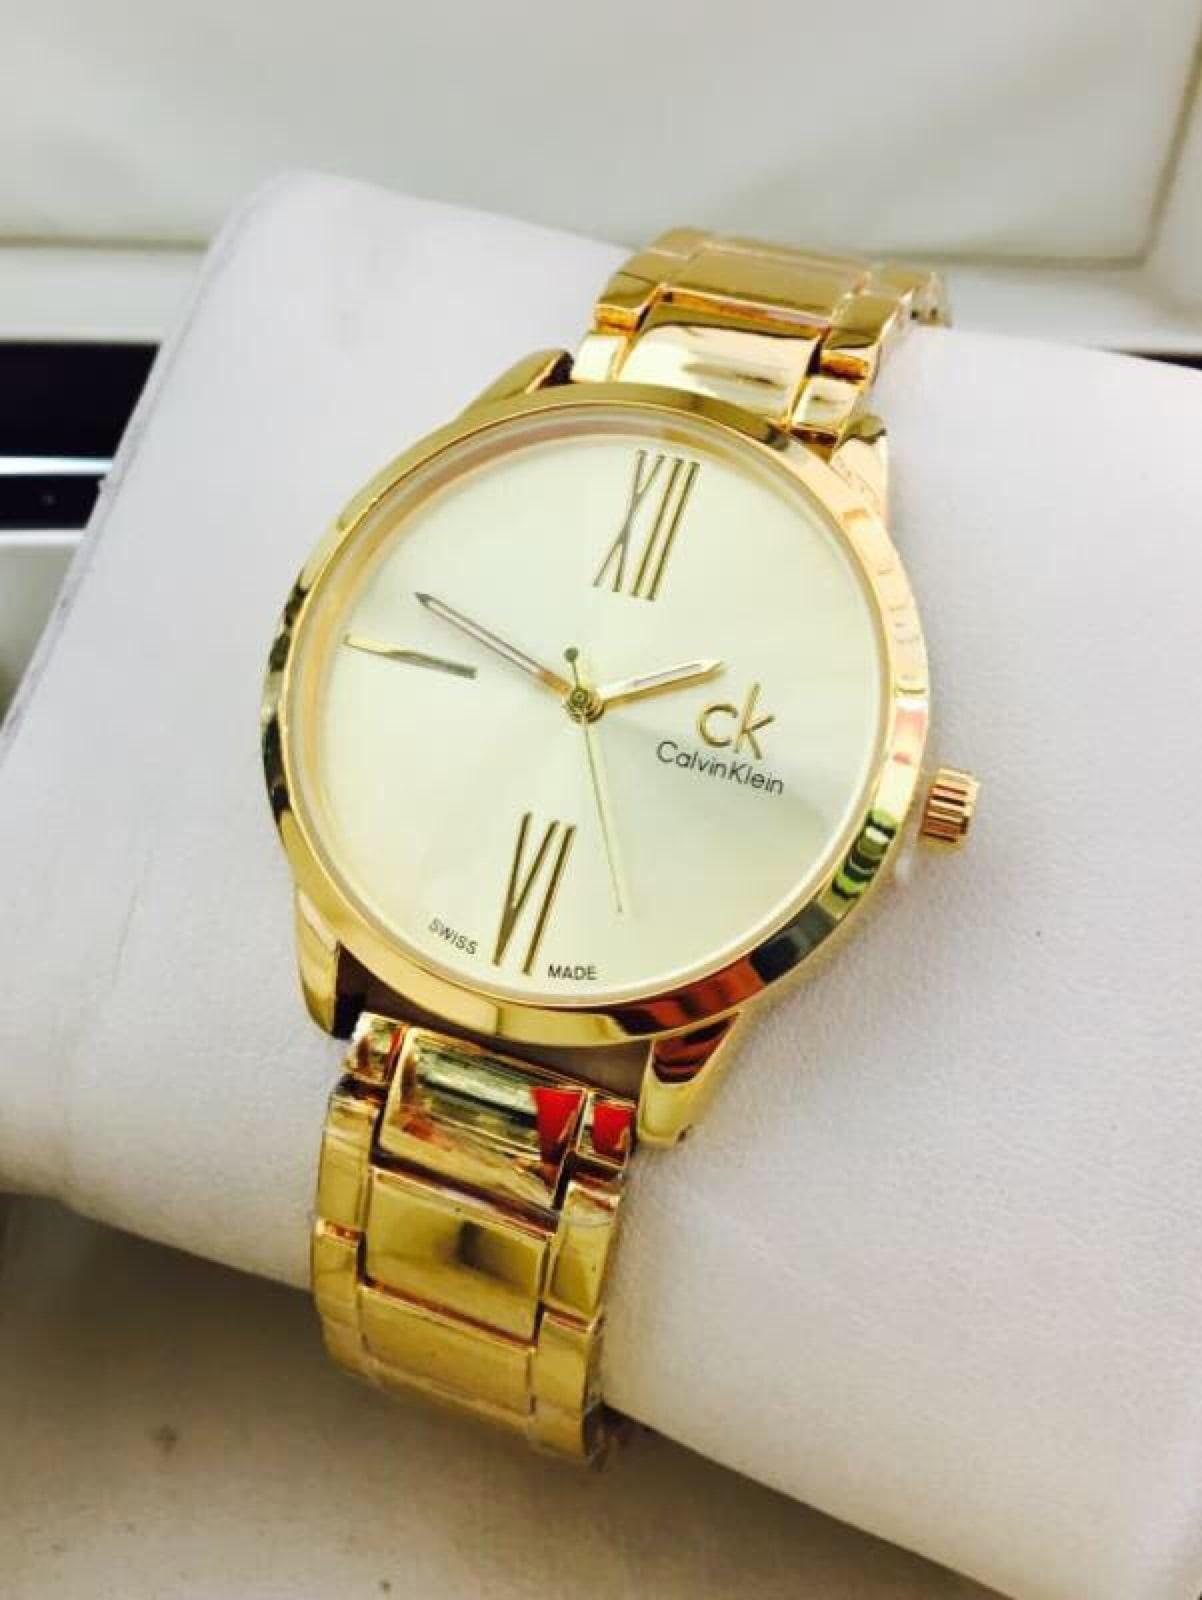 # Good quality girl's watches with high quality  #wedealsinluxurywatcheshandbagssunglassesperfumesbeltsetccashondeliveryalsoavailableformoredetailswhatsup919711083465